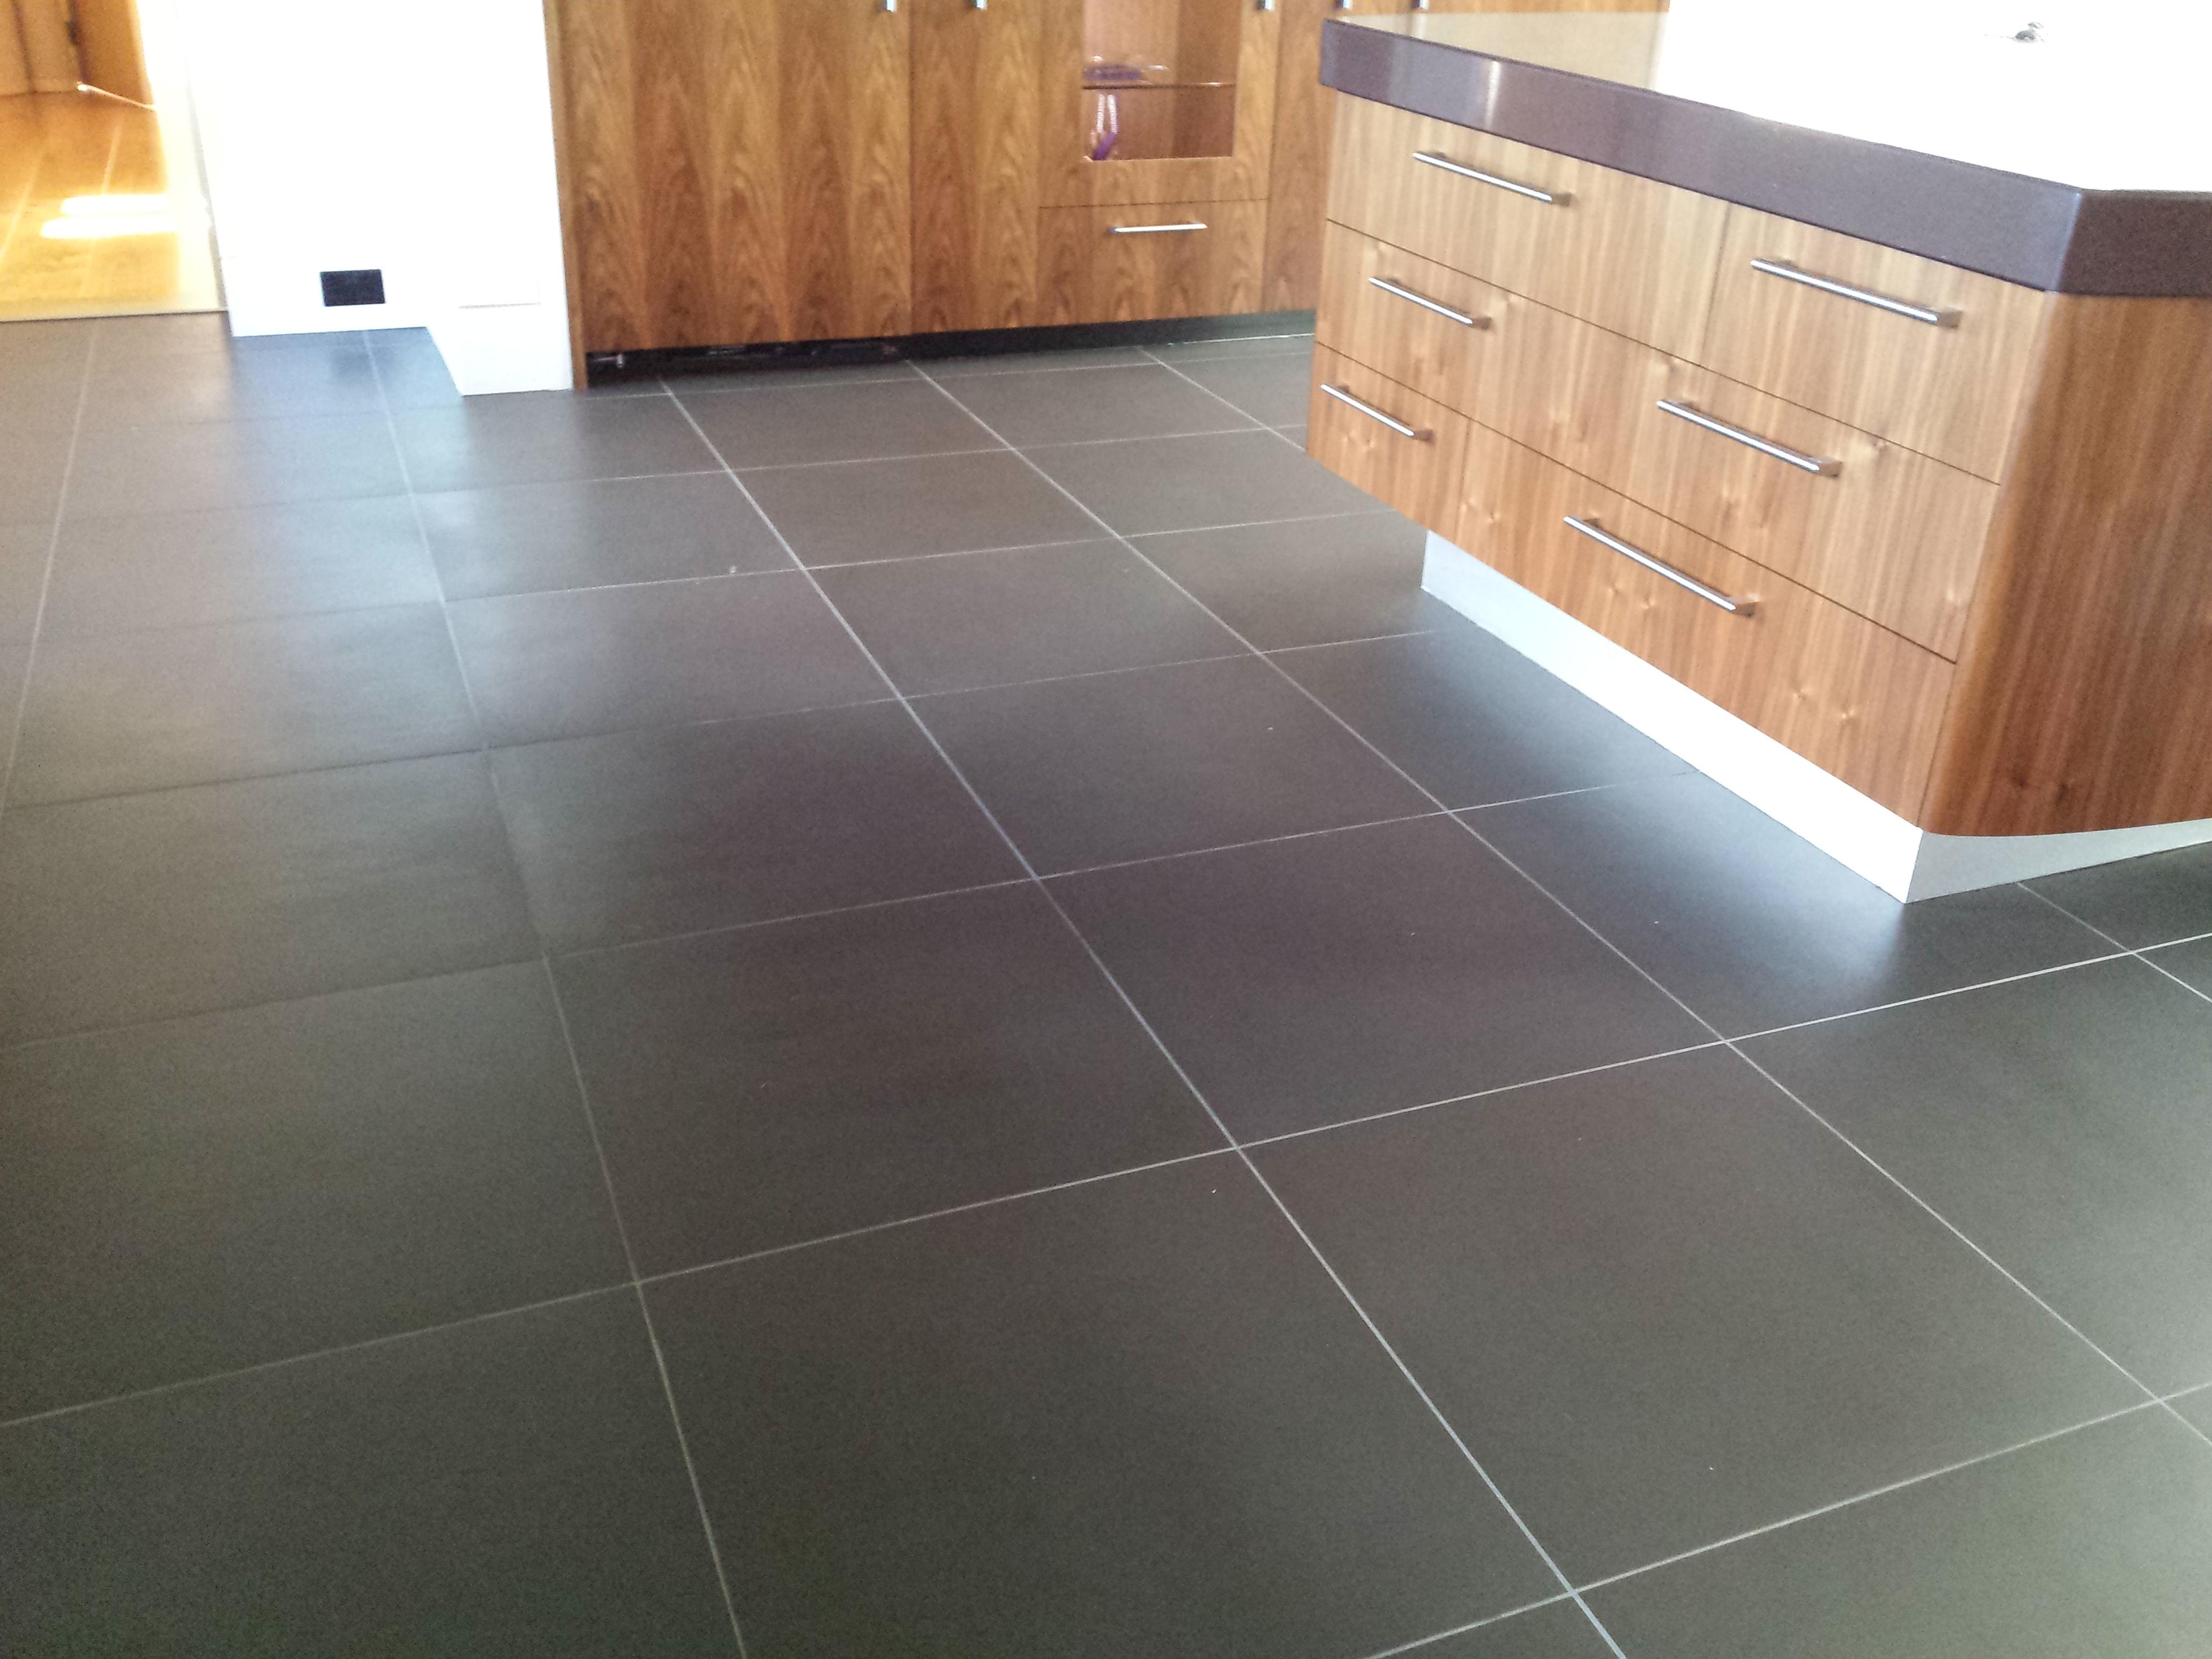 tiles grey polished floor mountain tile g light porcelain floors doblo from